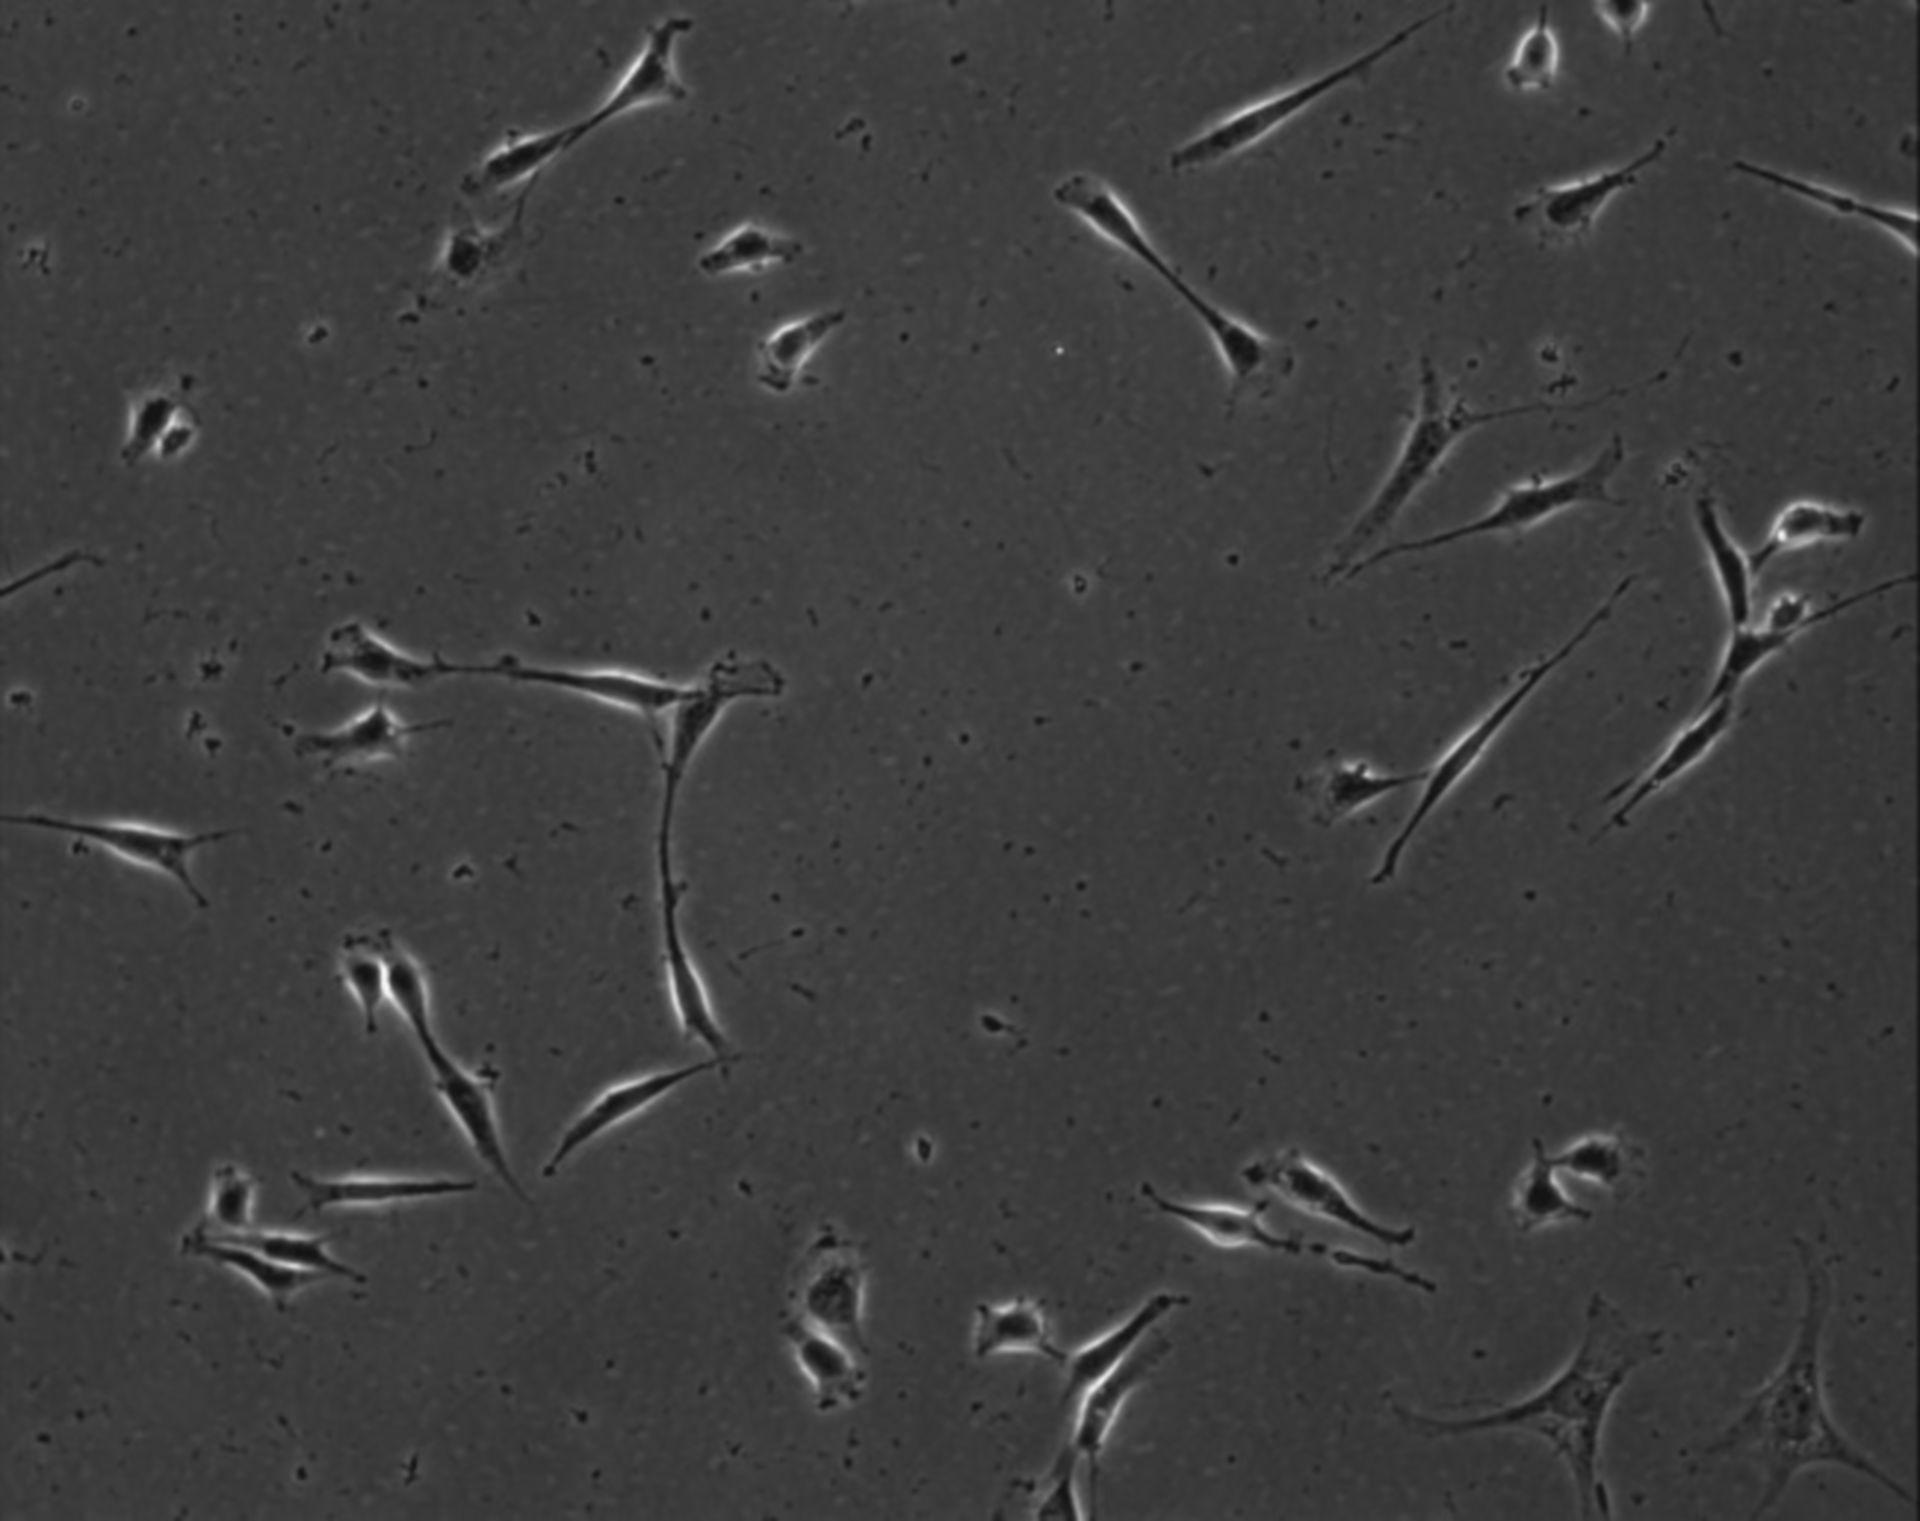 Mus musculus (Extracellular matrix part) - CIL:8844